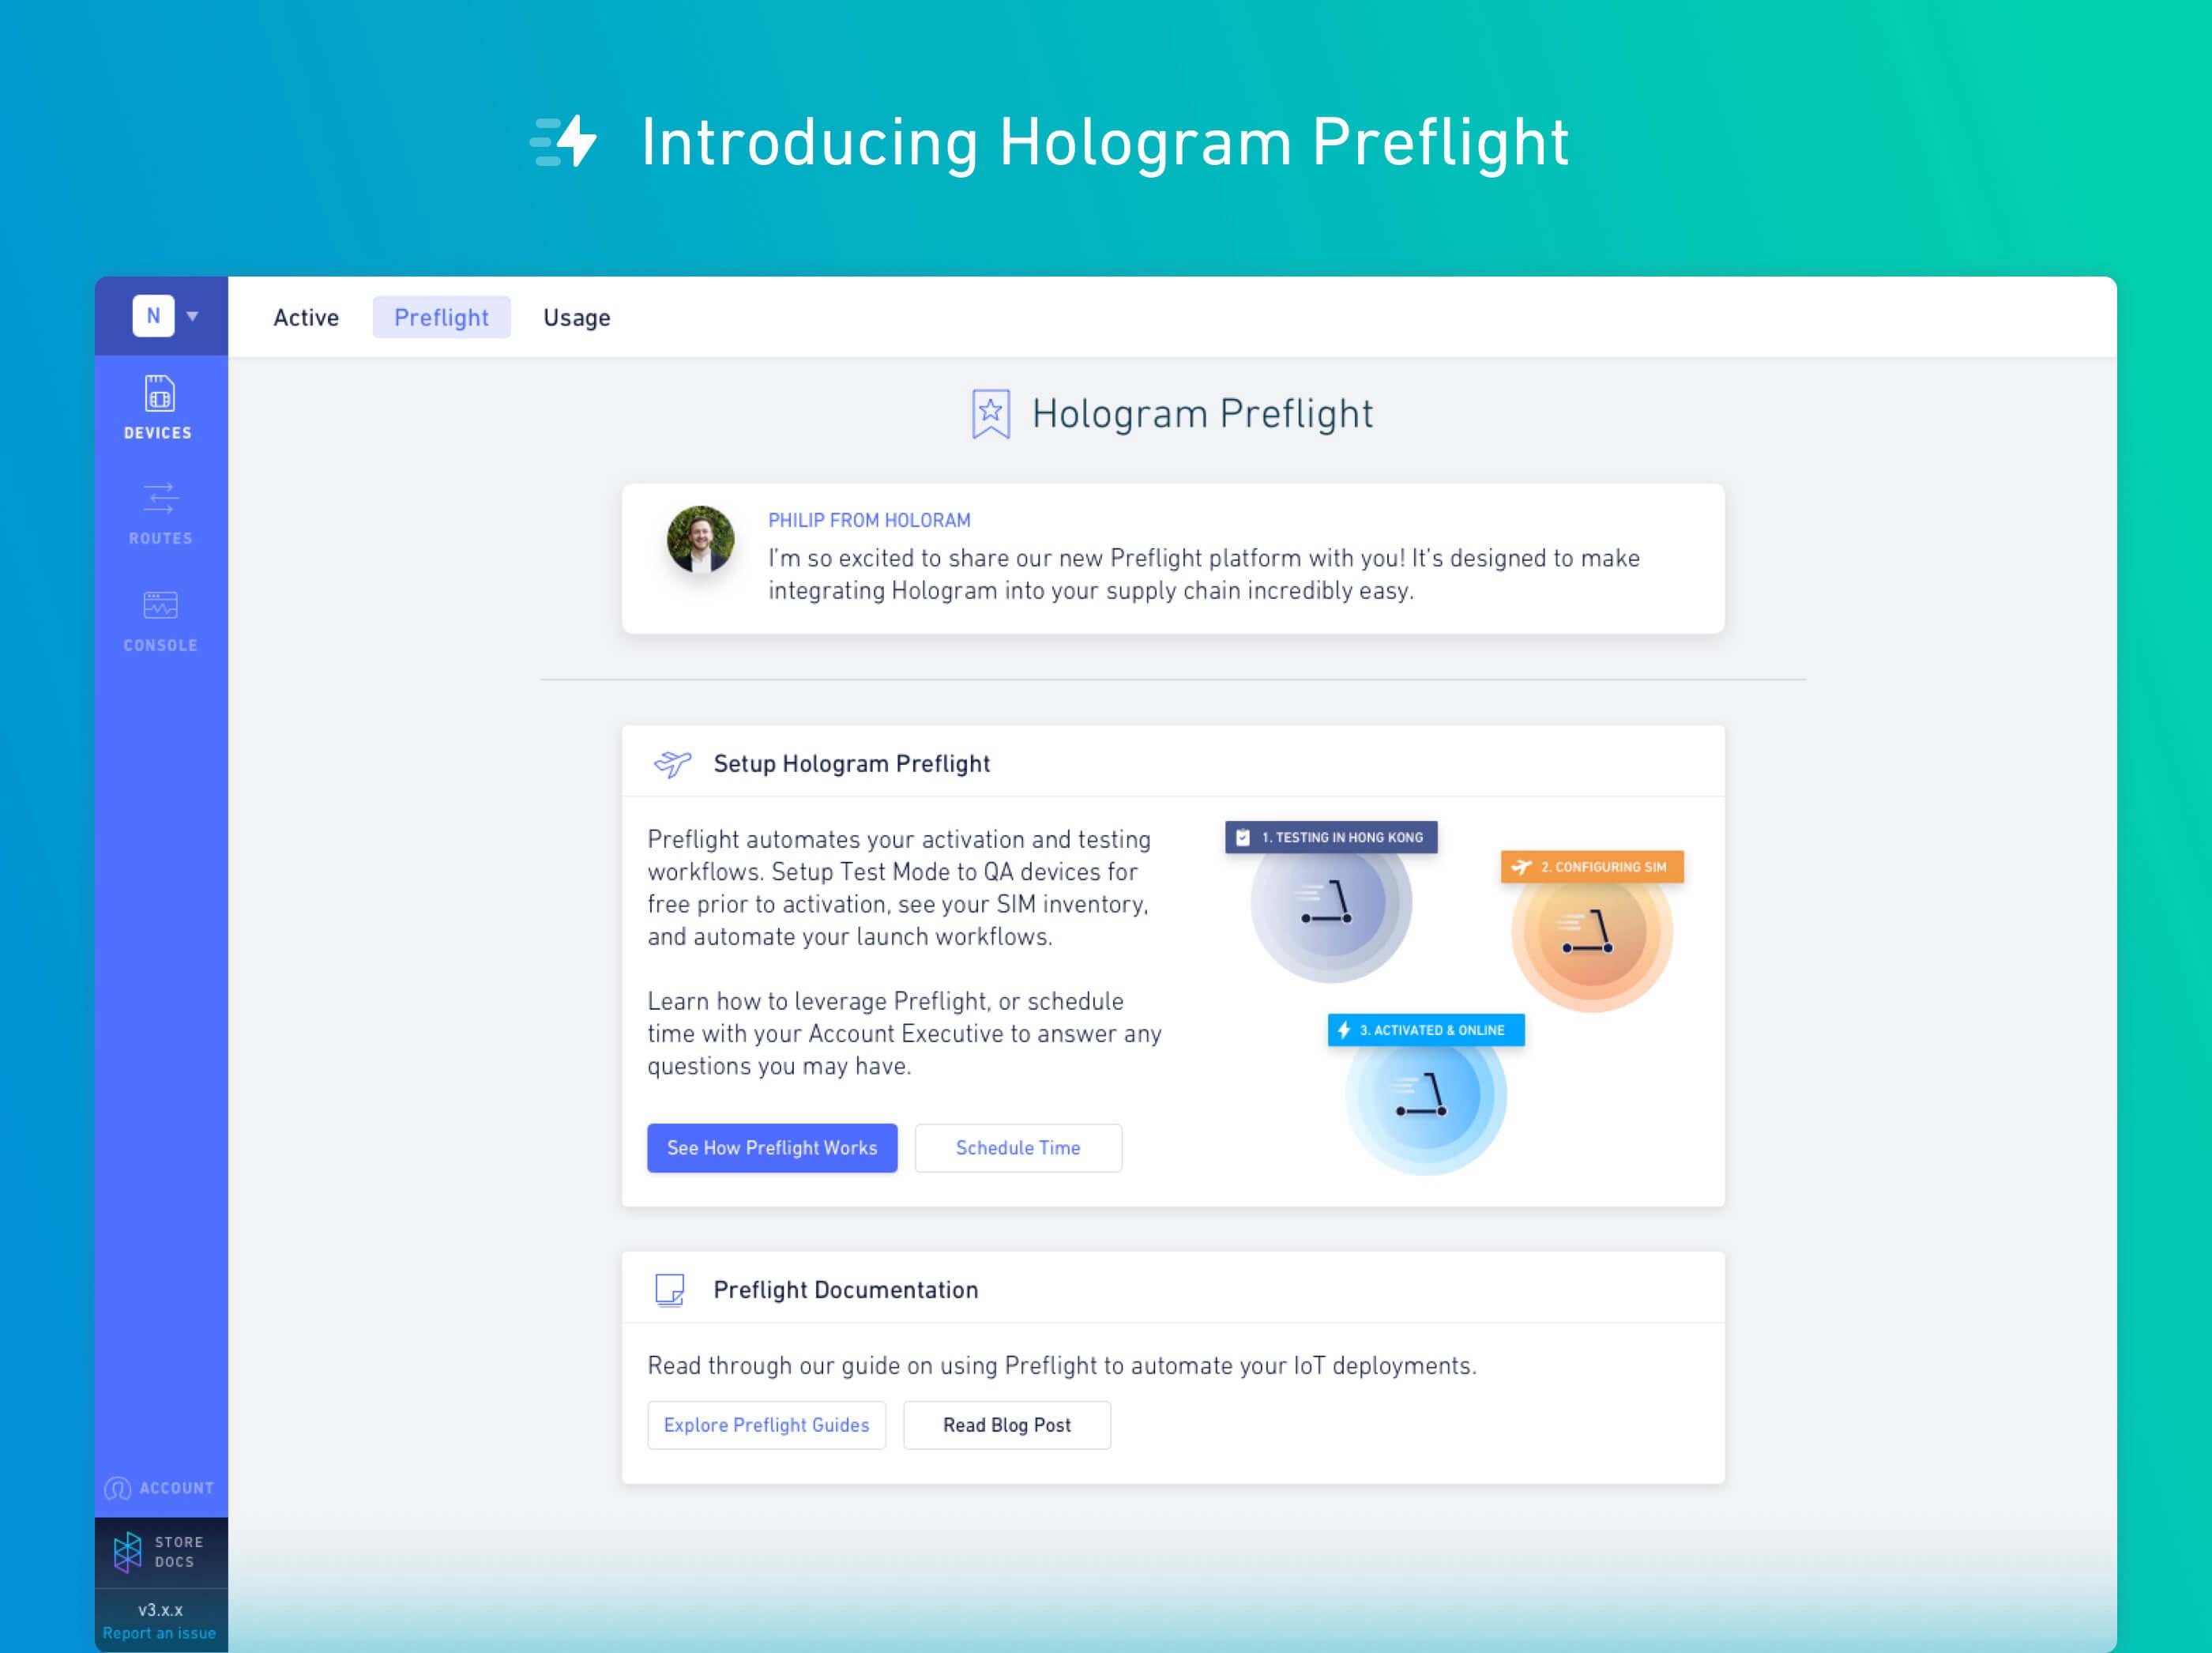 Introducing Hologram Preflight